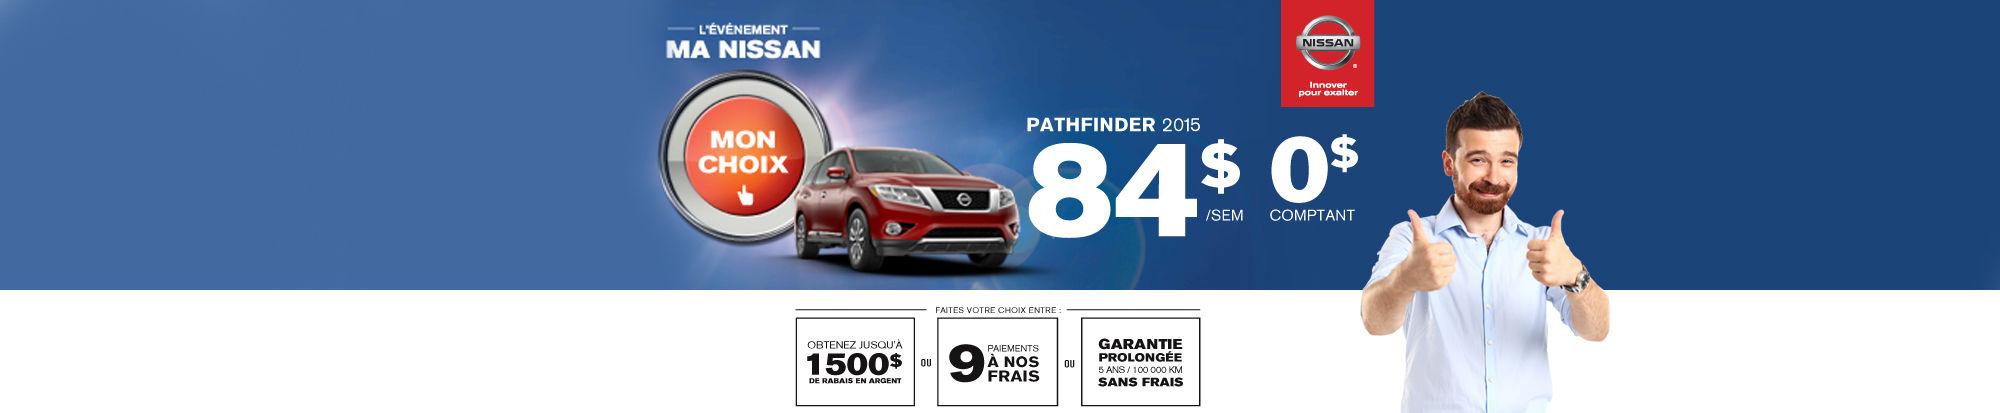 Nissan Pathfinder juin